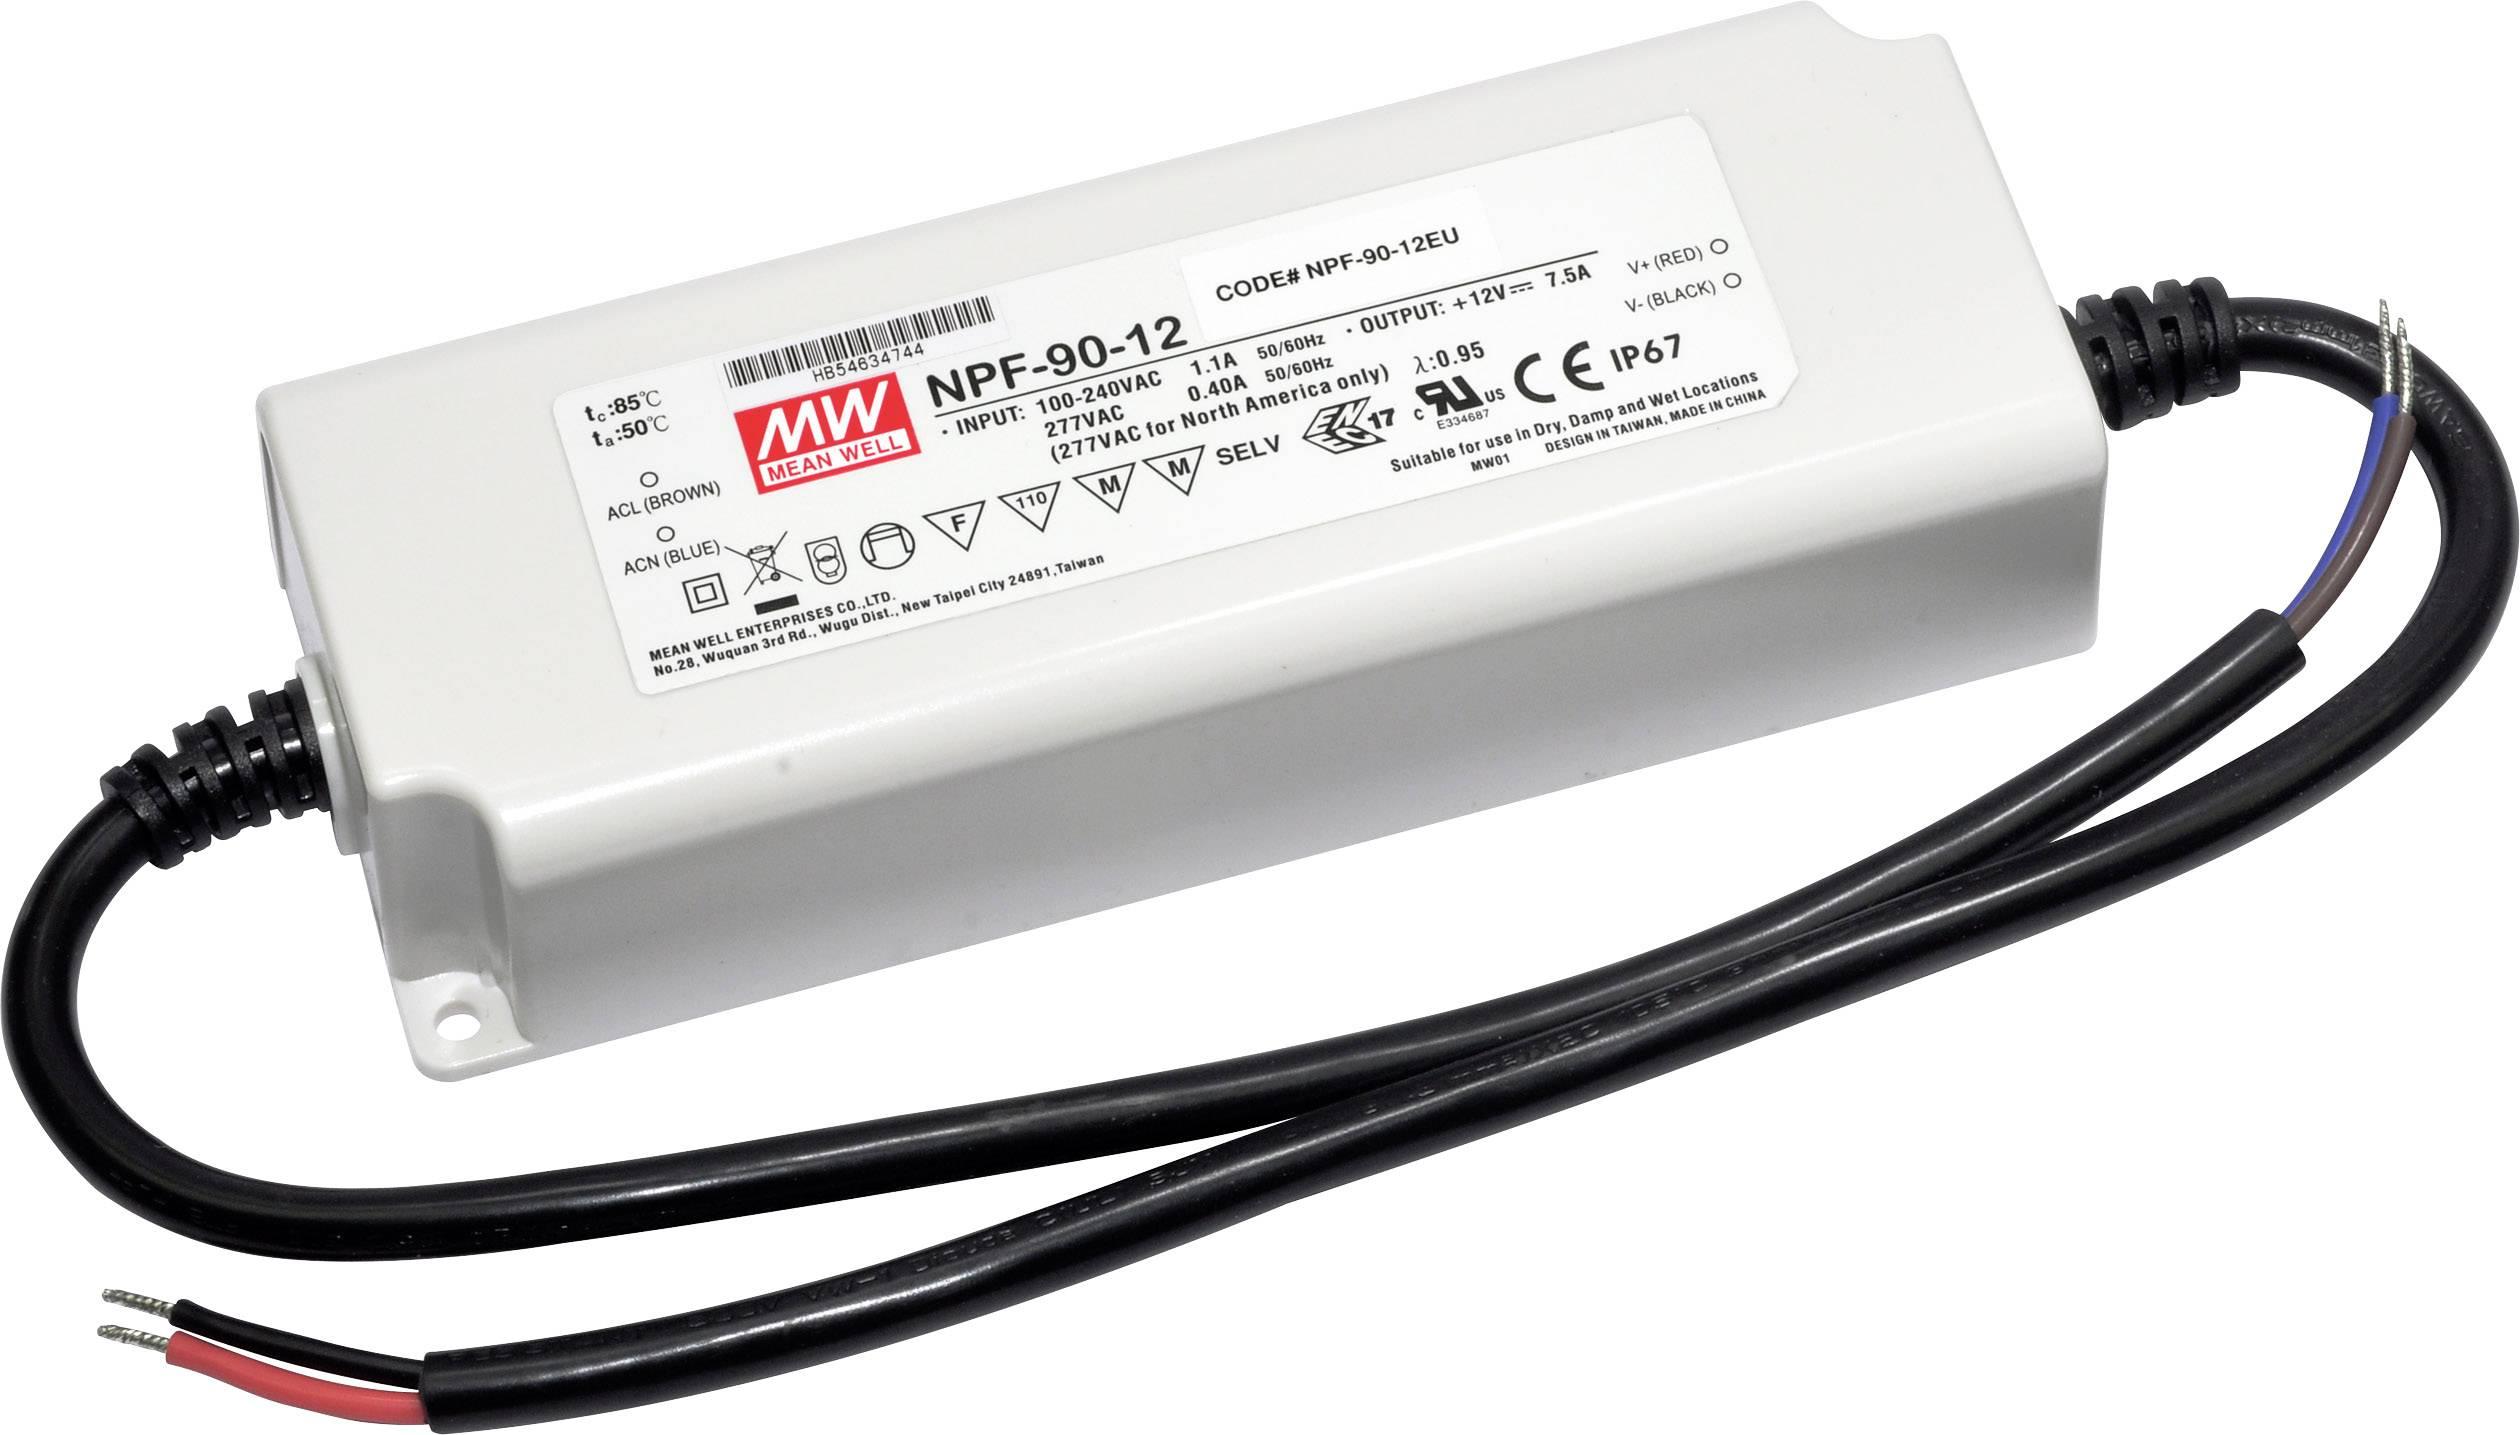 LED driver, napájecí zdroj pro LED Mean Well NPF-90D-54, 90 W (max), 1.67 A, 32.4 - 54 V/DC